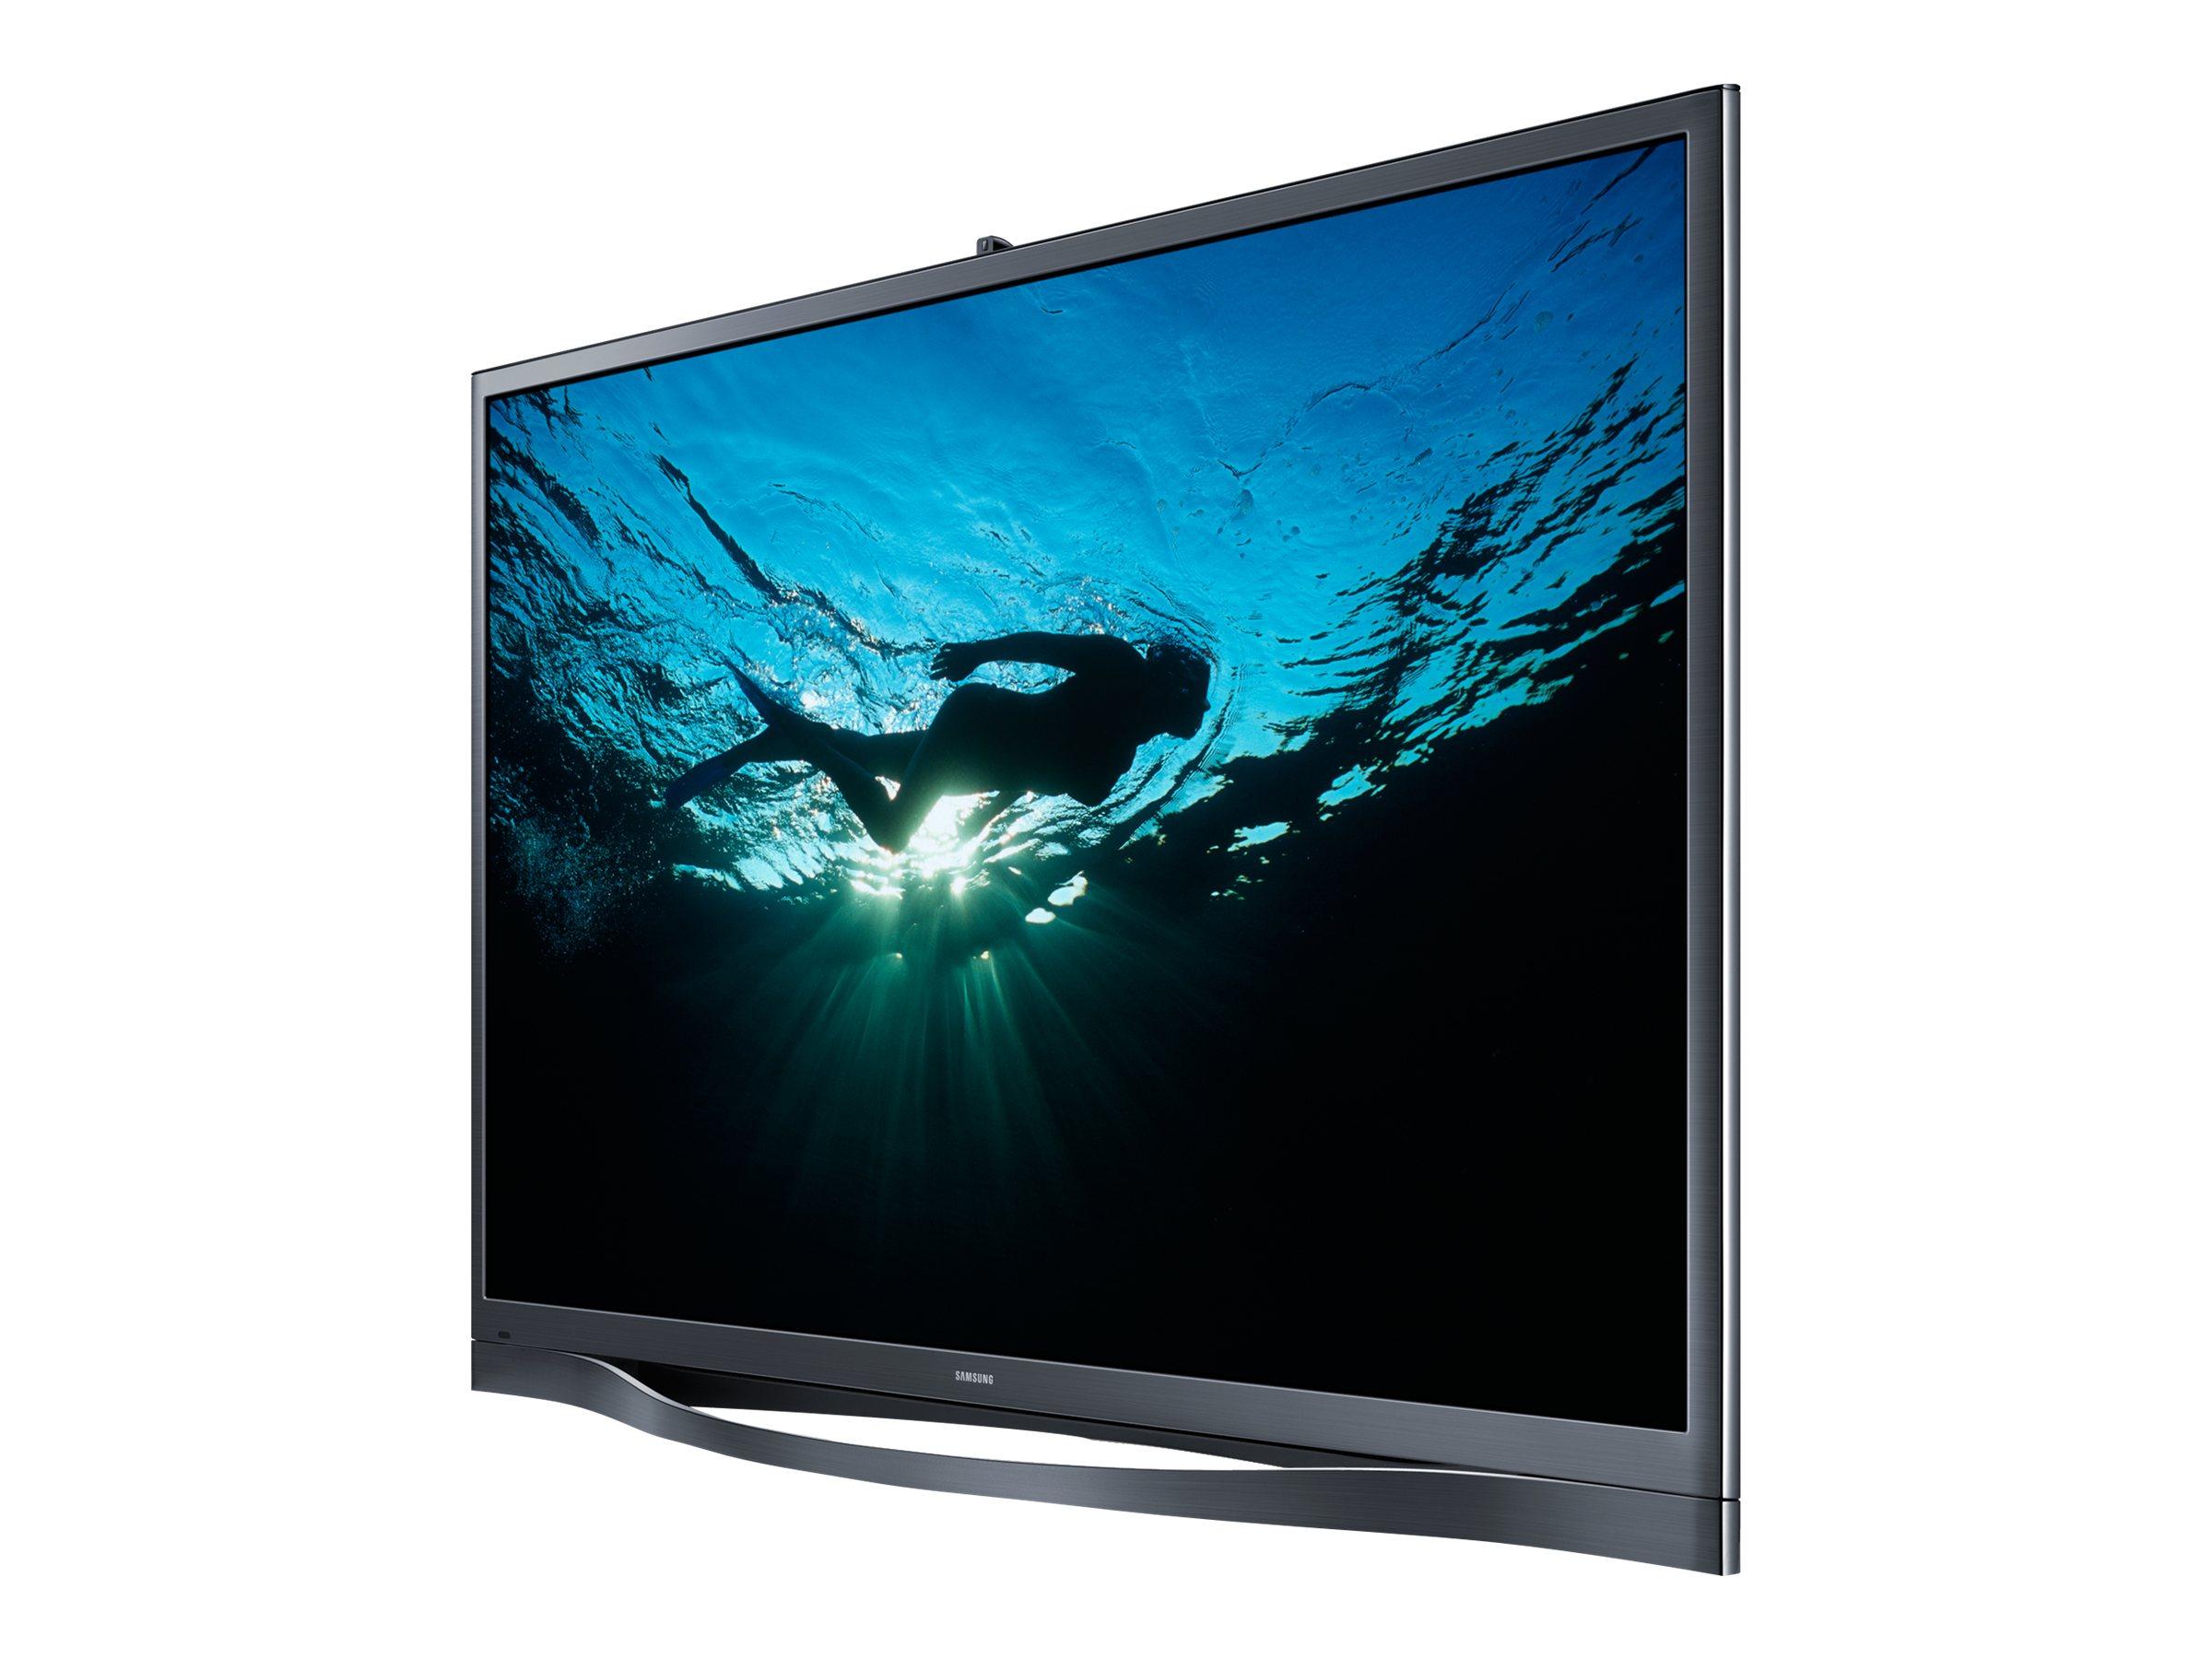 "Samsung 64"" Class 3D Smart Plasma HDTV with Glasses - PN64F8500"